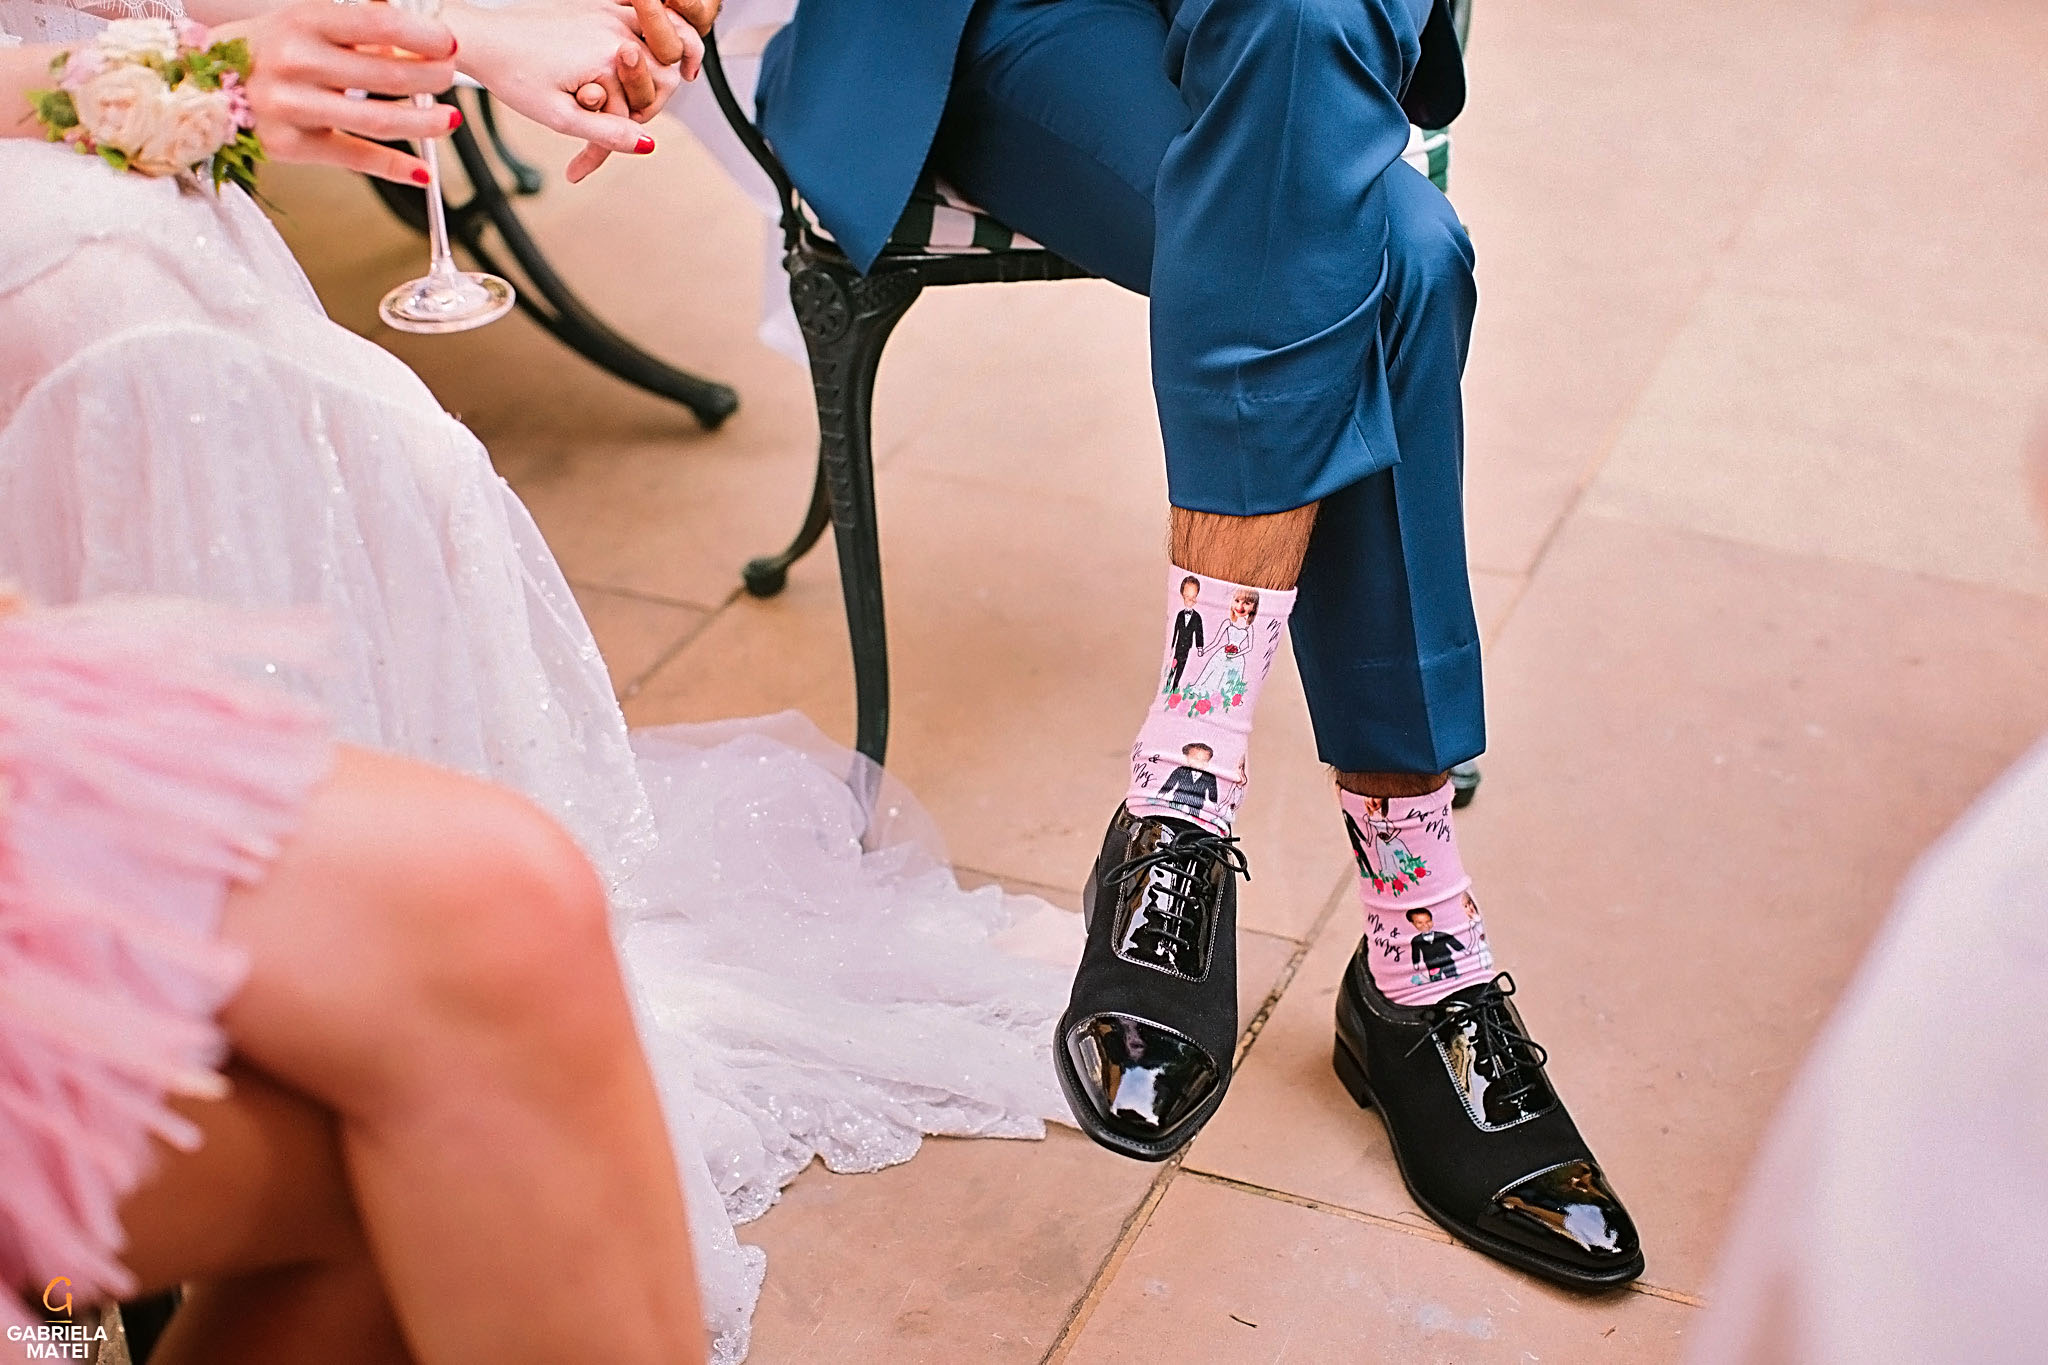 Detail shot of the groom's funny wedding socks